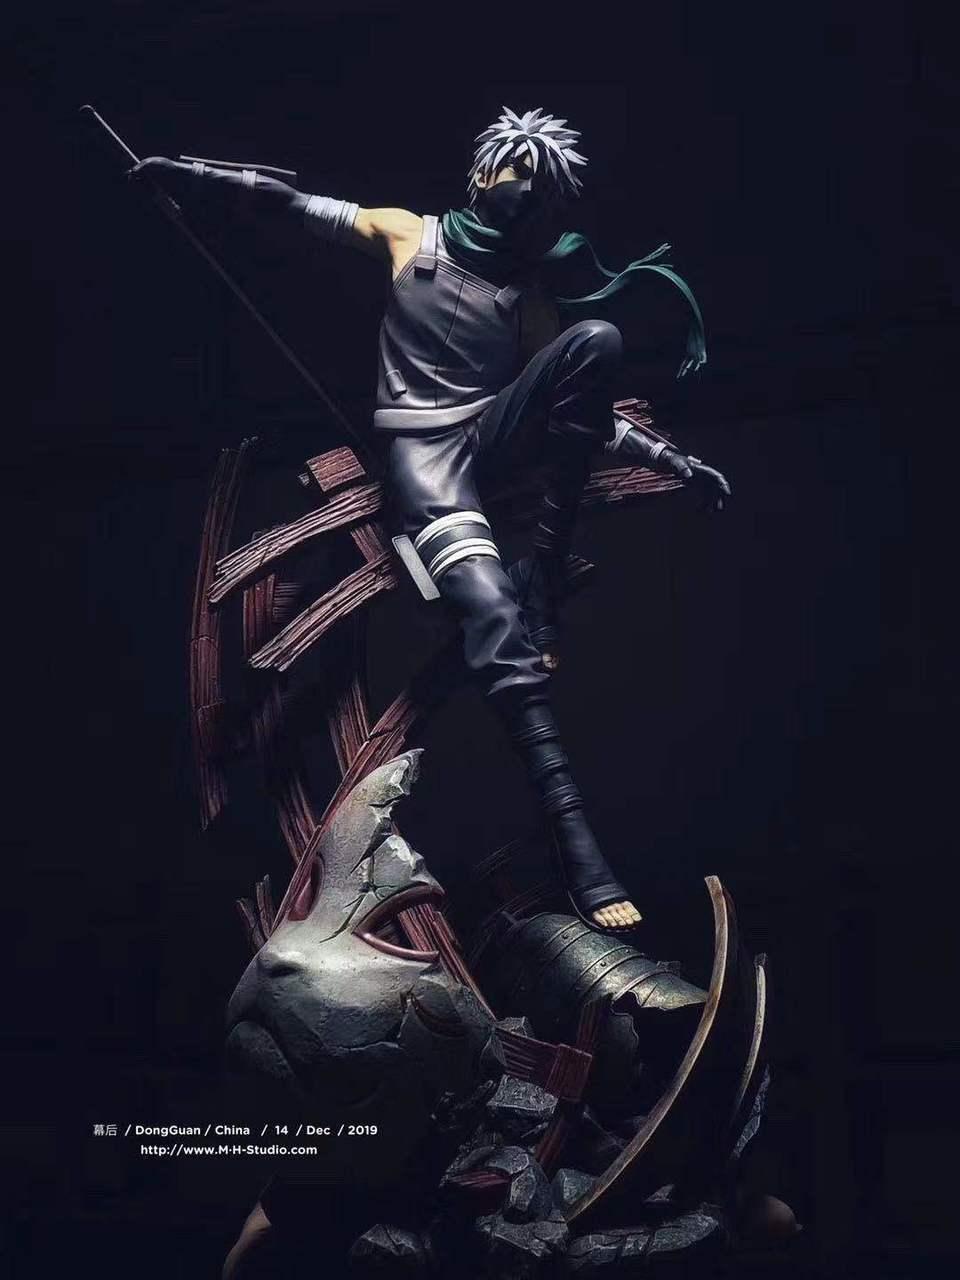 Image of [In-Stock]Naruto MH Studio Kakashi Anbu Resin Statue